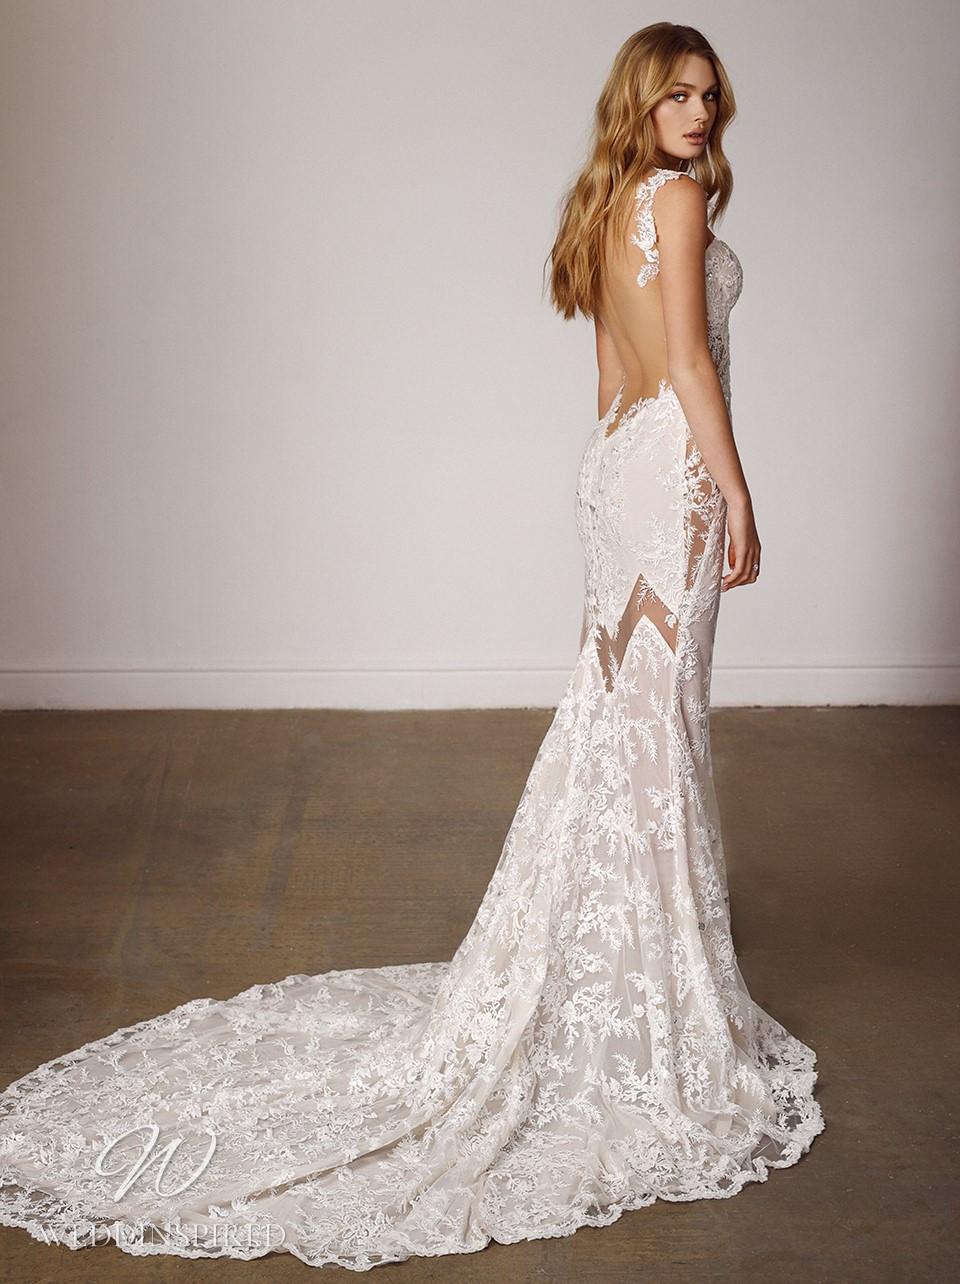 A Galia Lahav 2022 sexy lace mermaid wedding dress with a low back